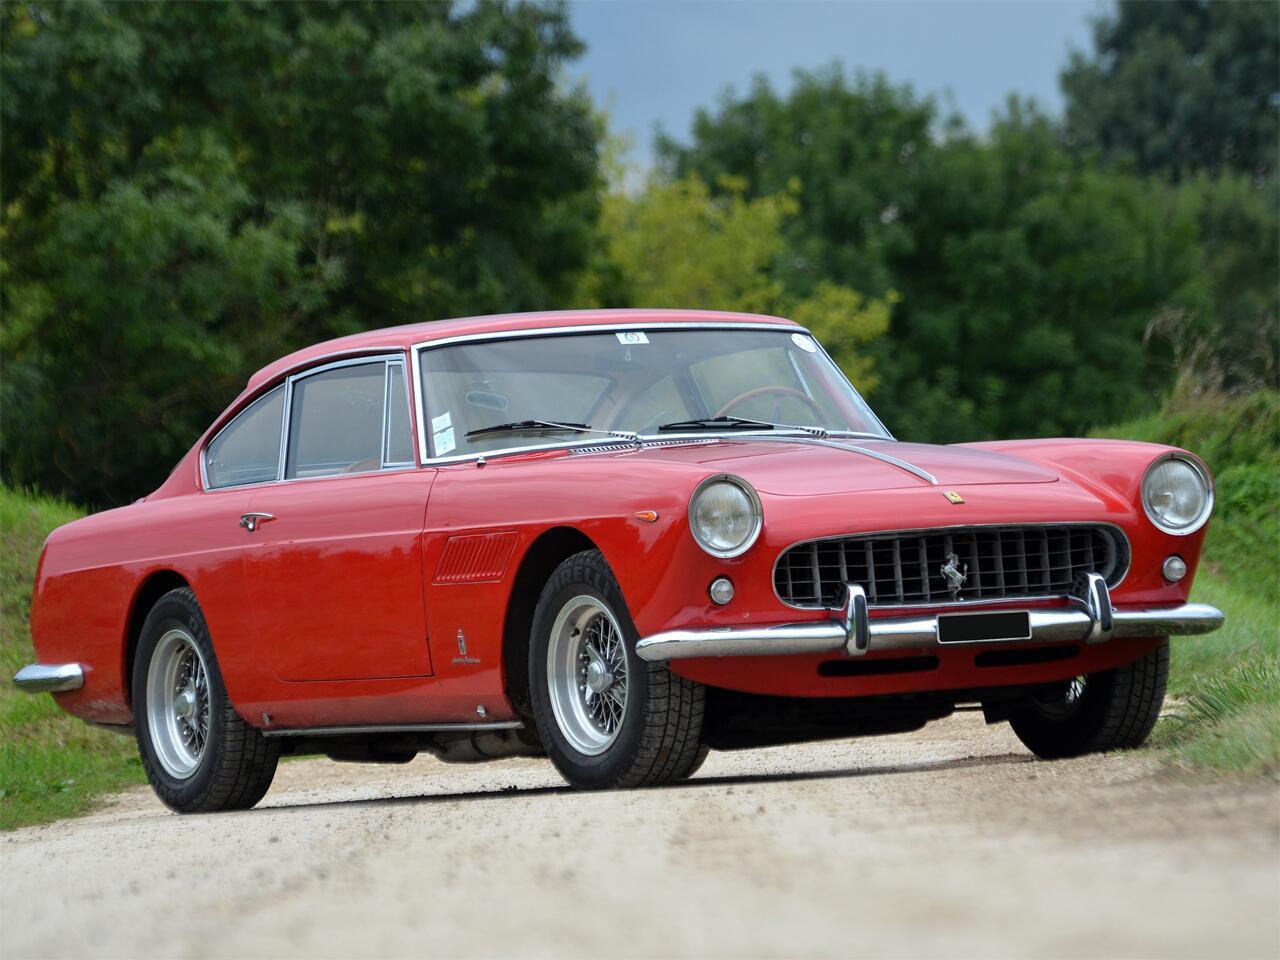 Bild zu Ferrari 250 GTE (1962)